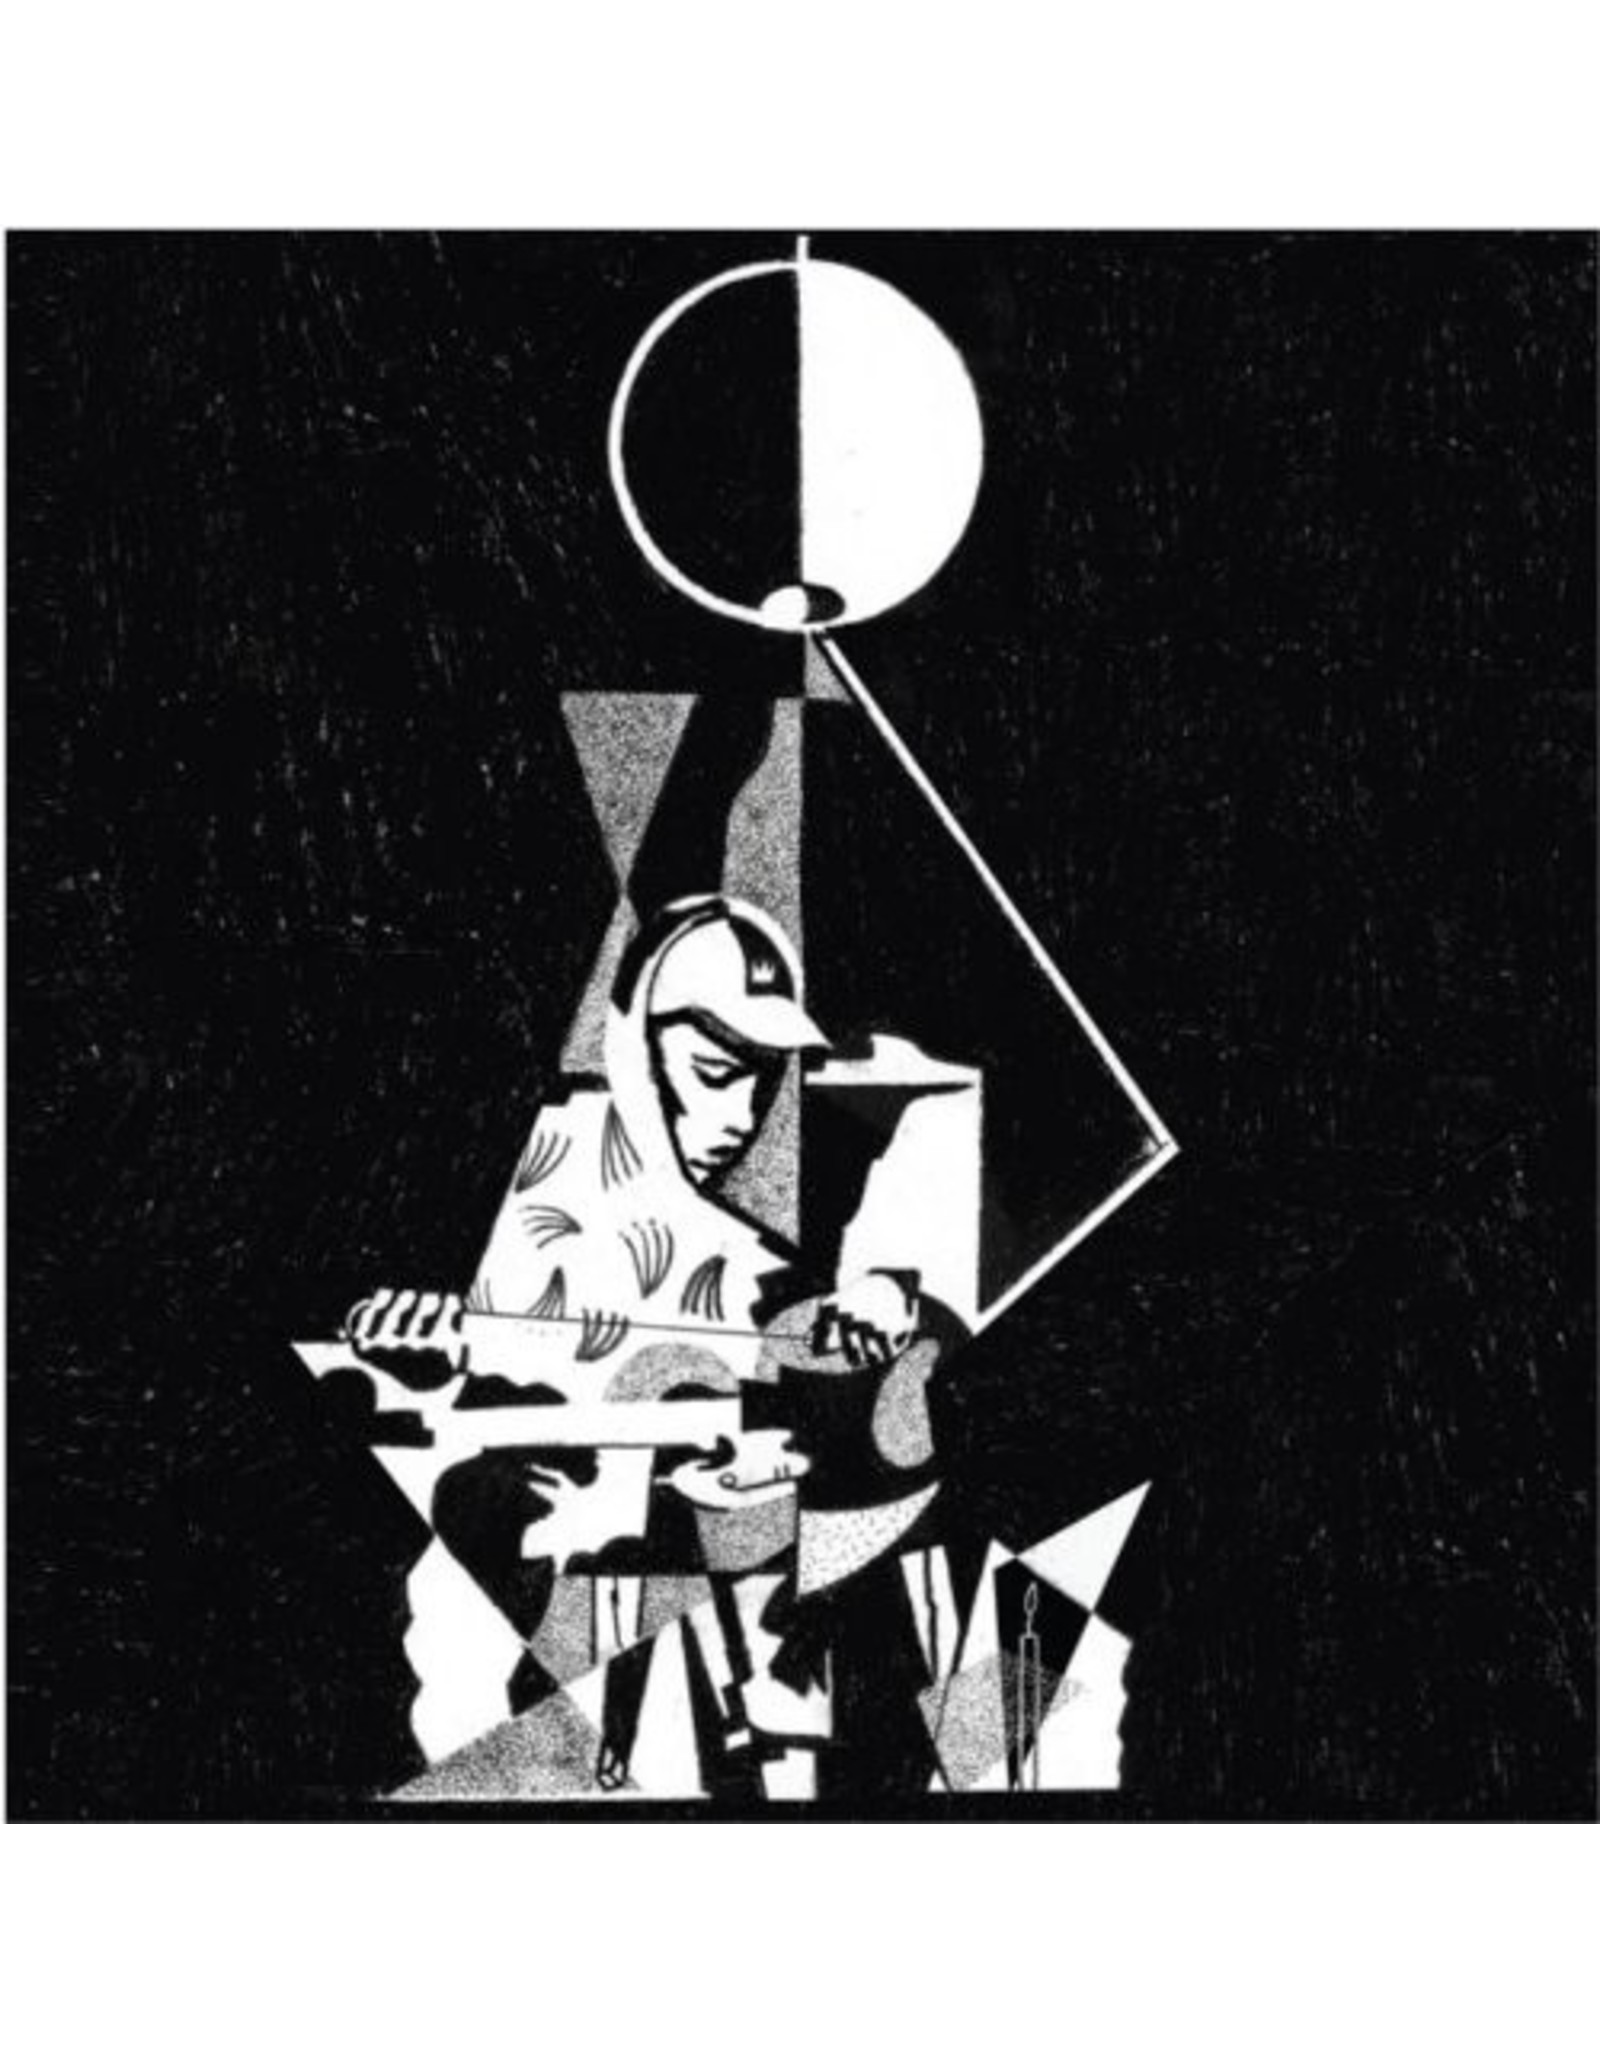 New Vinyl King Krule - 6 Feet Beneath The Moon 2LP